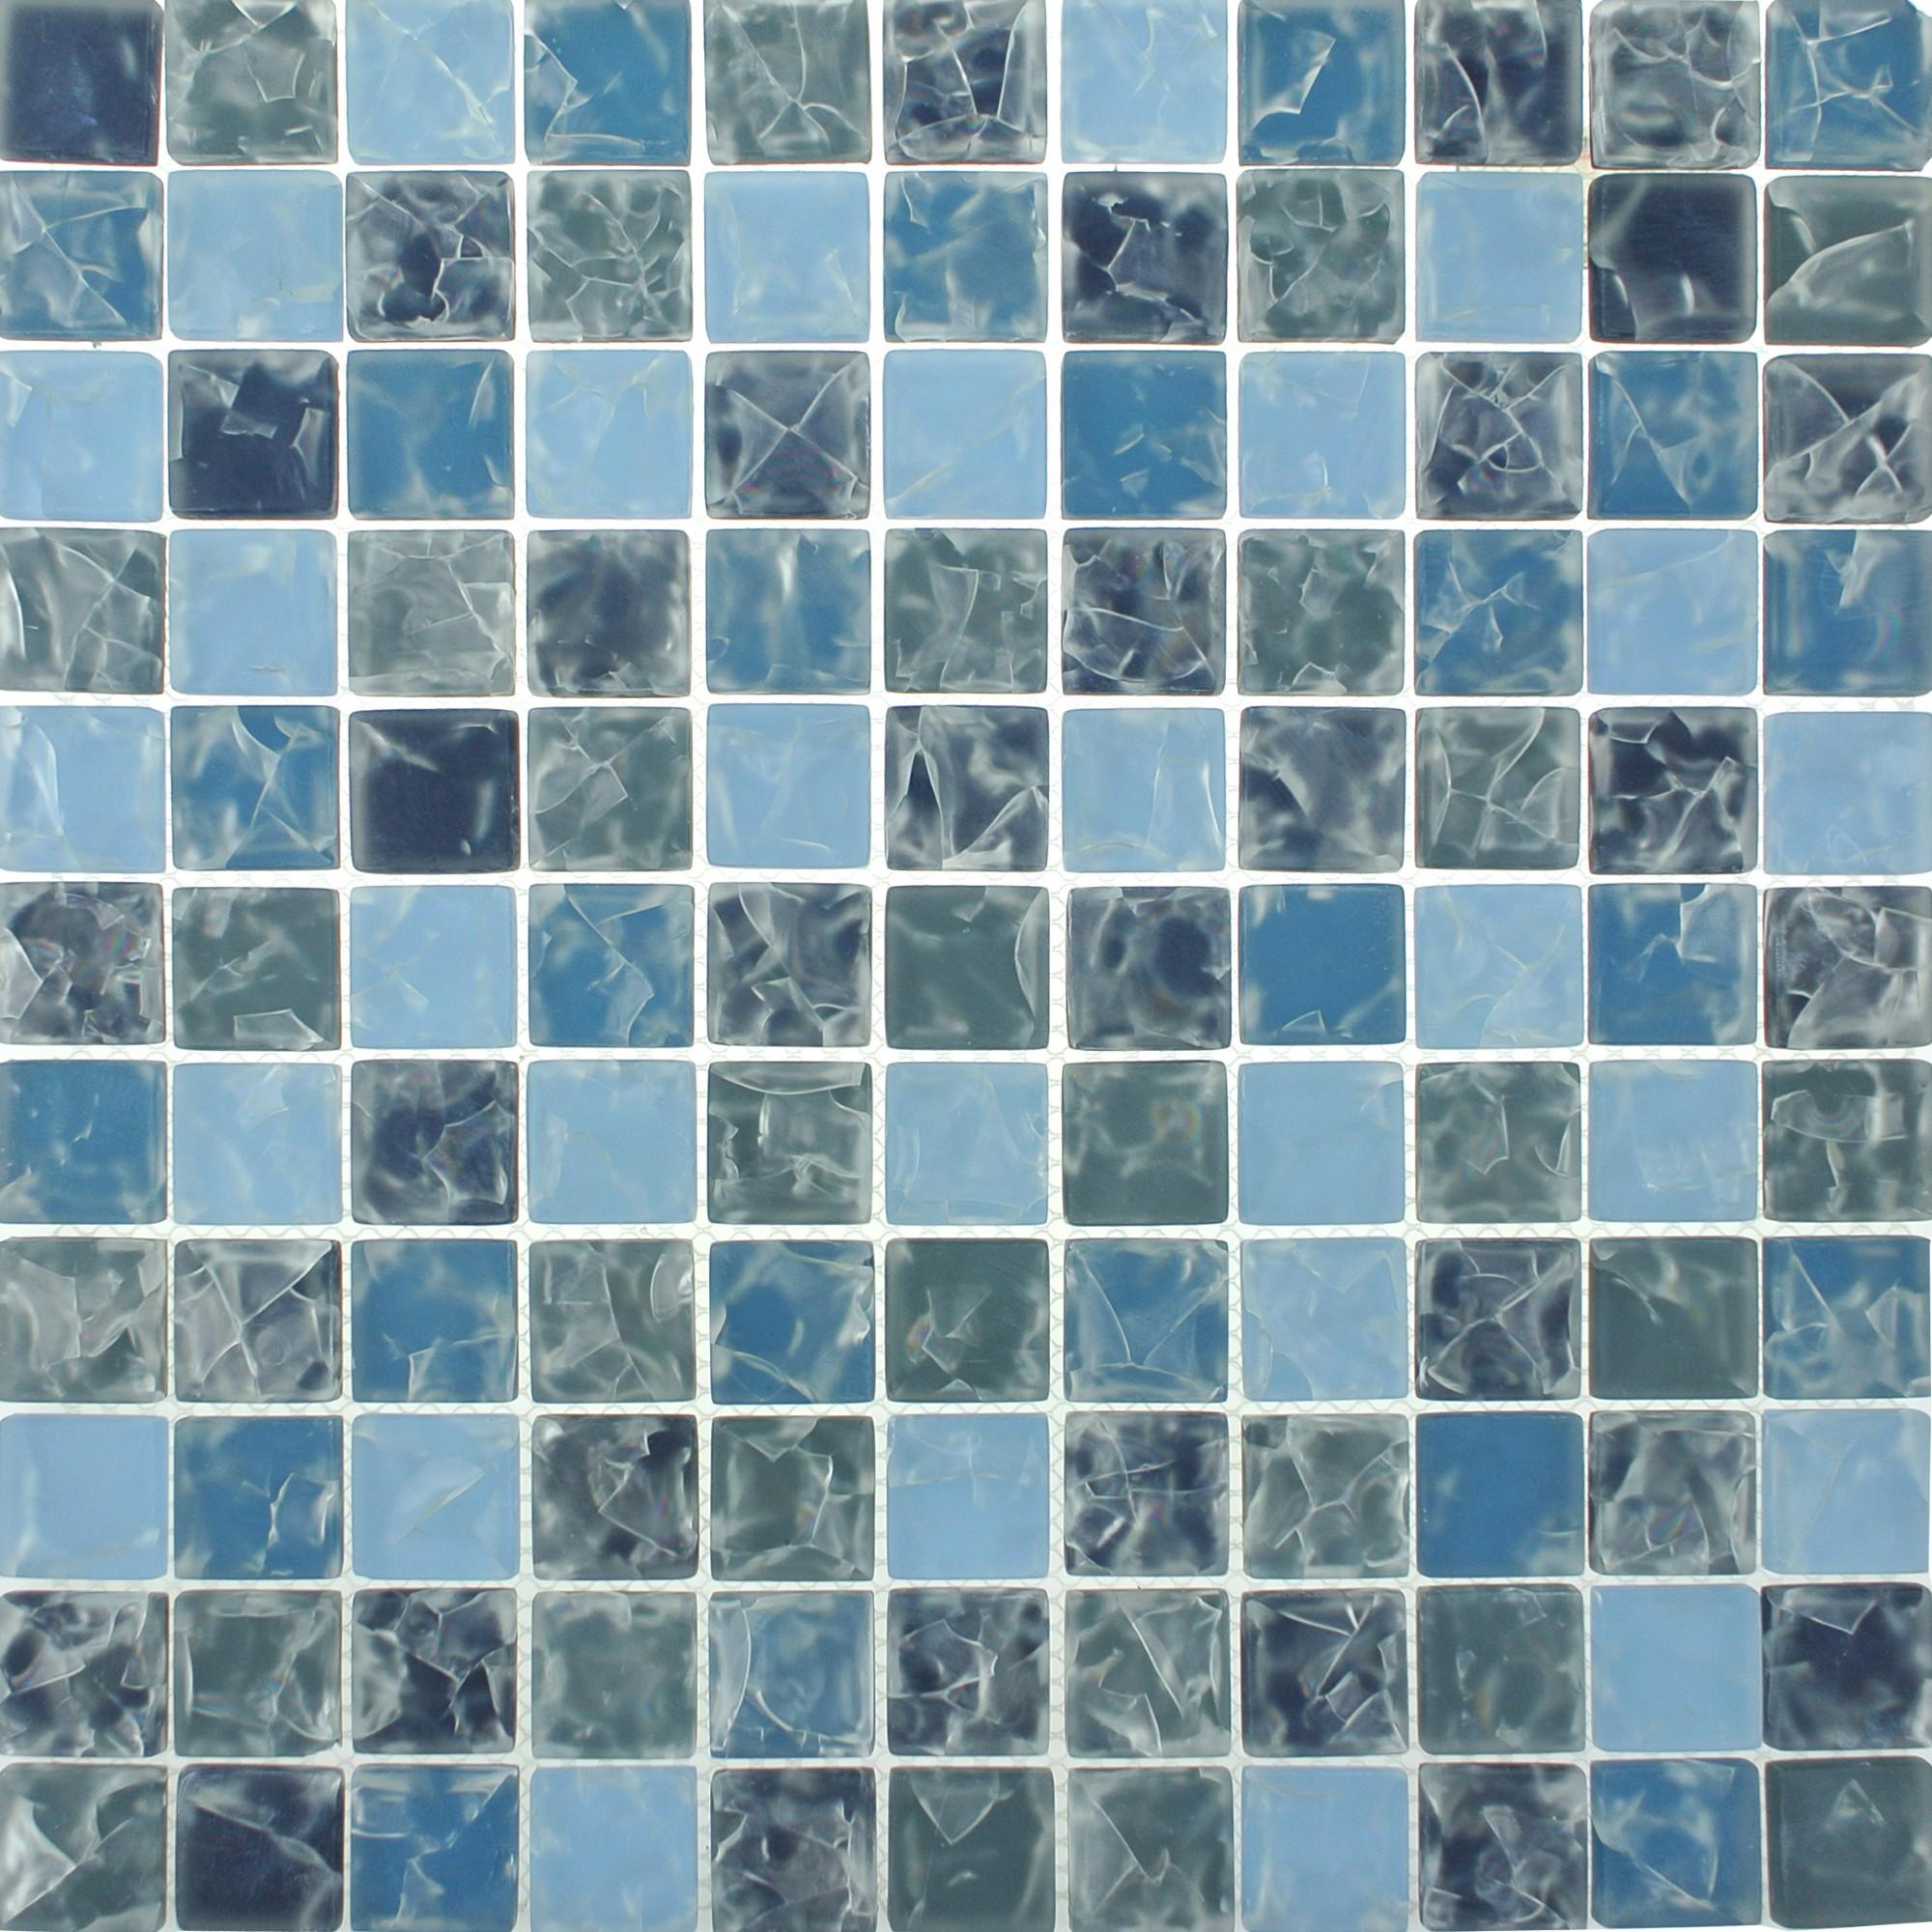 Pastilha de Vidro Craquelada 25x25cm Azul Claro - MC003B - Jolie